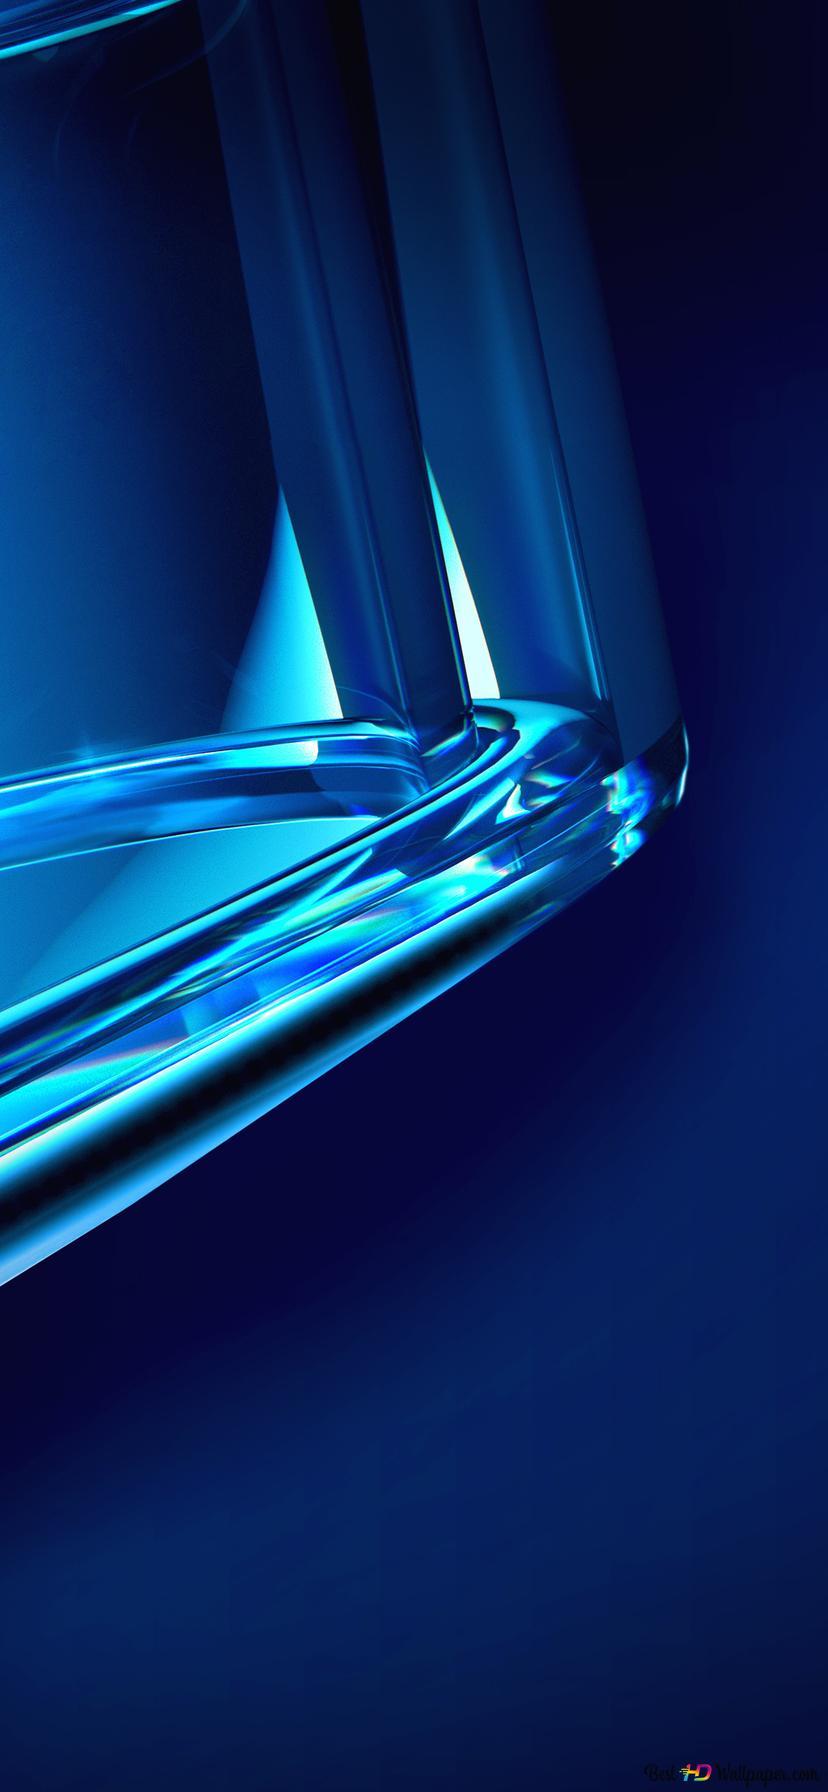 Blue Glass Edge Hd Wallpaper Download